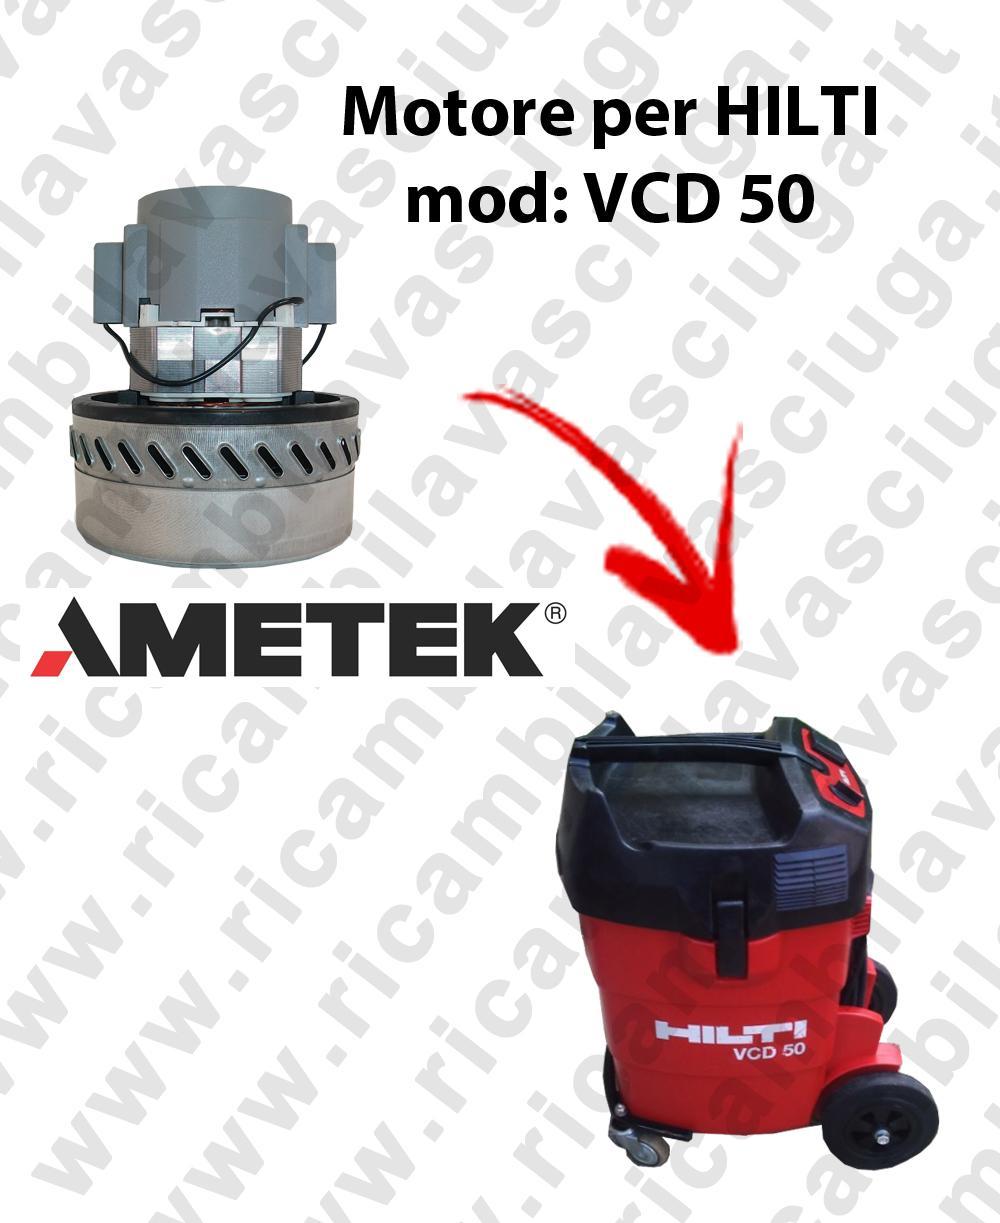 VCD 50 Motore de aspiraciónAMETEK para aspiradora y aspiradora húmeda HILTI